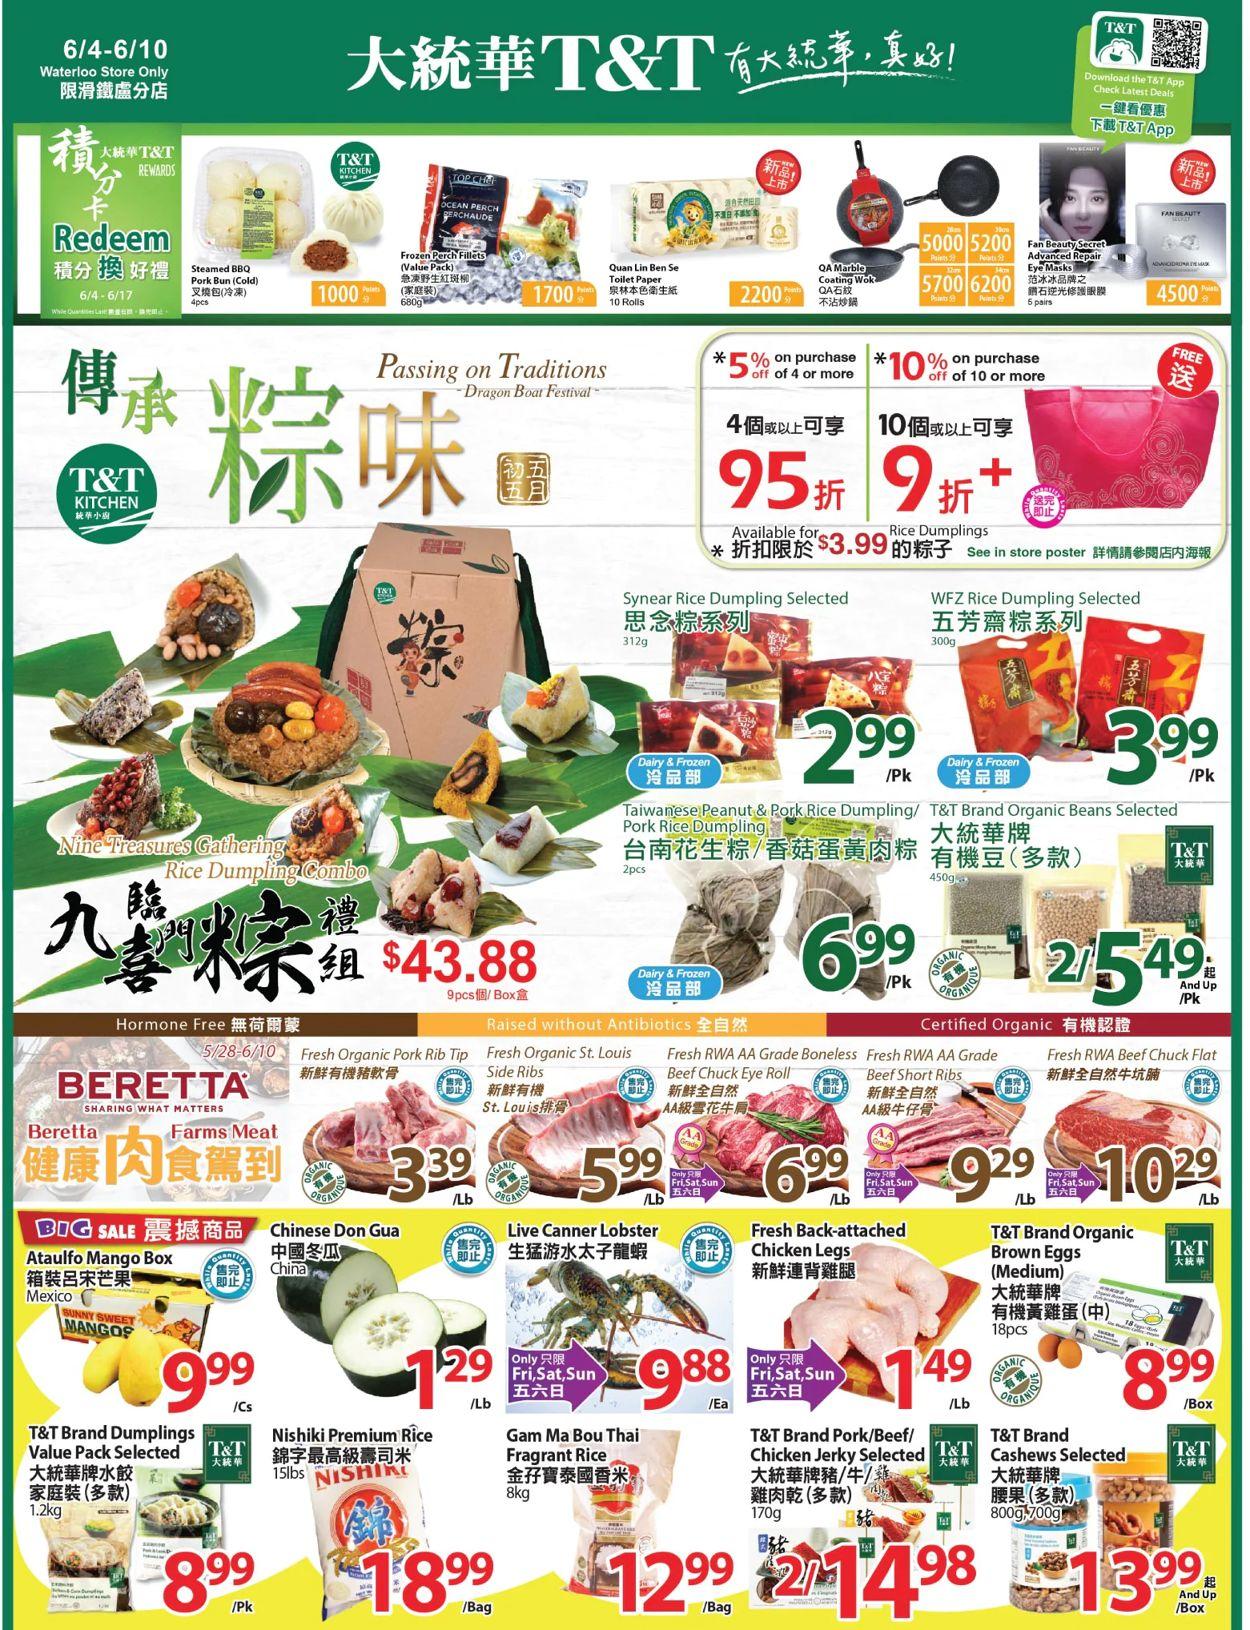 T&T Supermarket - Waterloo Flyer - 06/04-06/10/2021